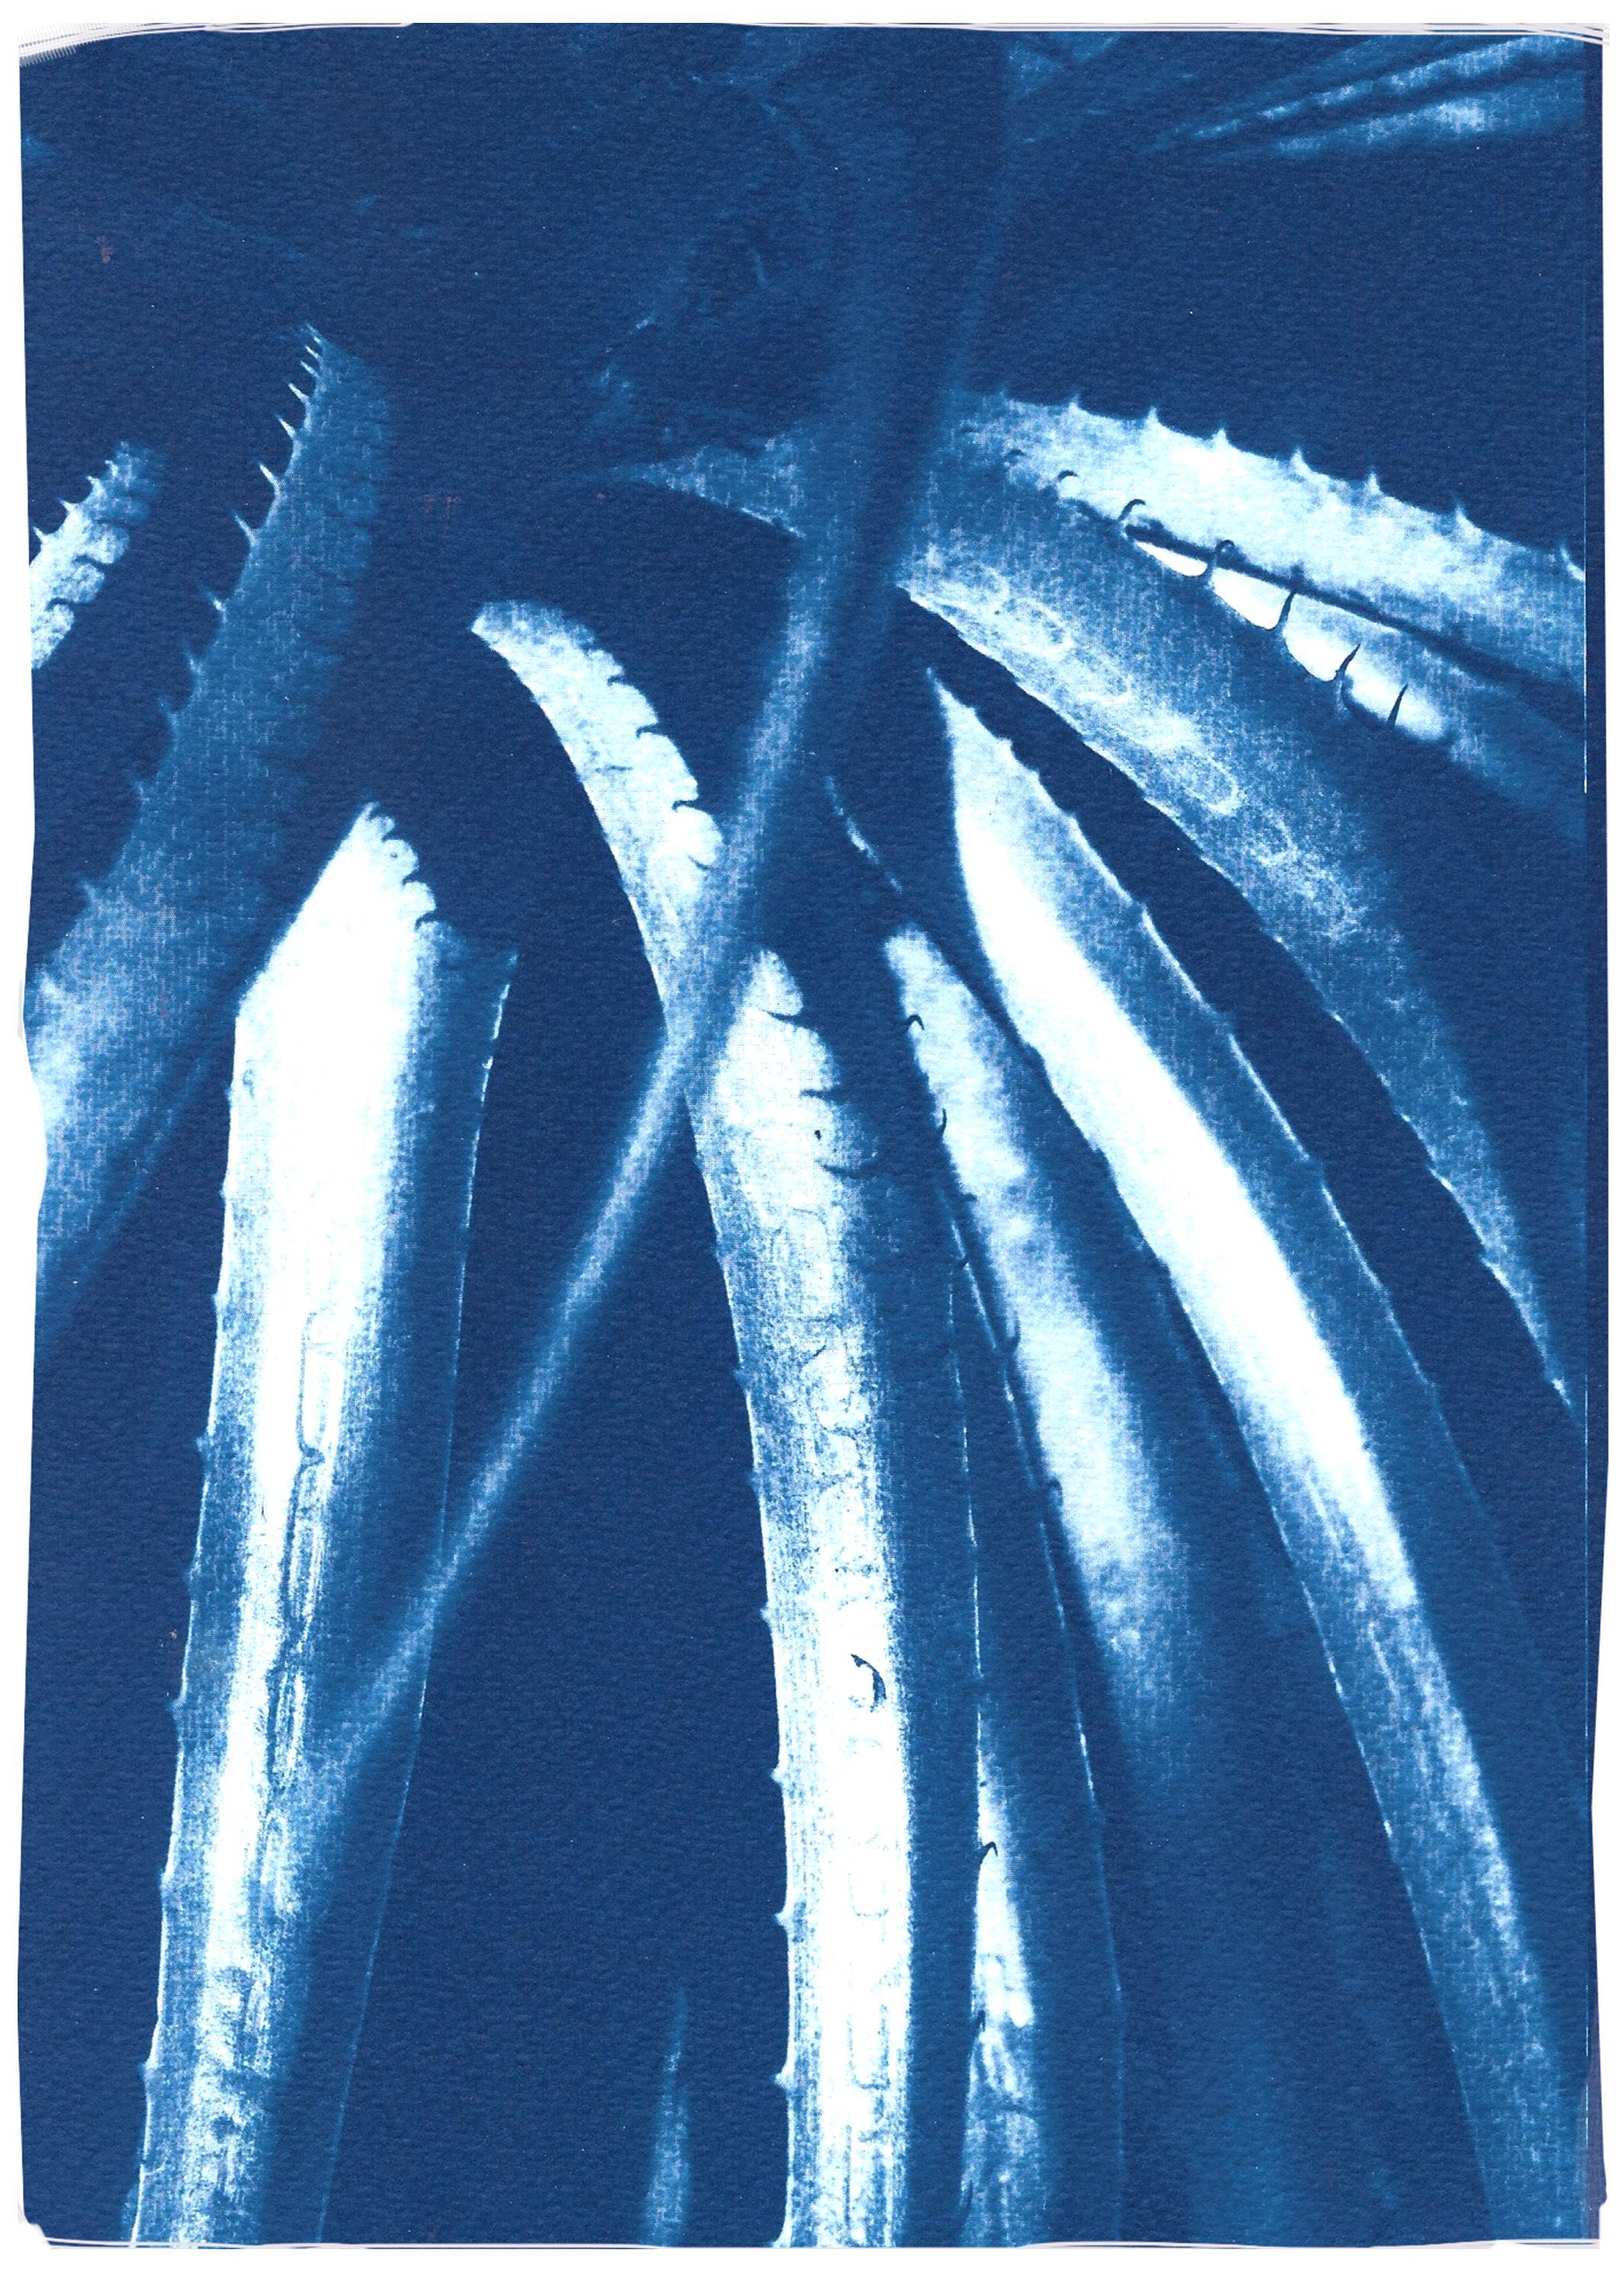 Blue Tones Jurassic Aloe Leaves, Botanical Cyanotype on Paper, Close Up Plants